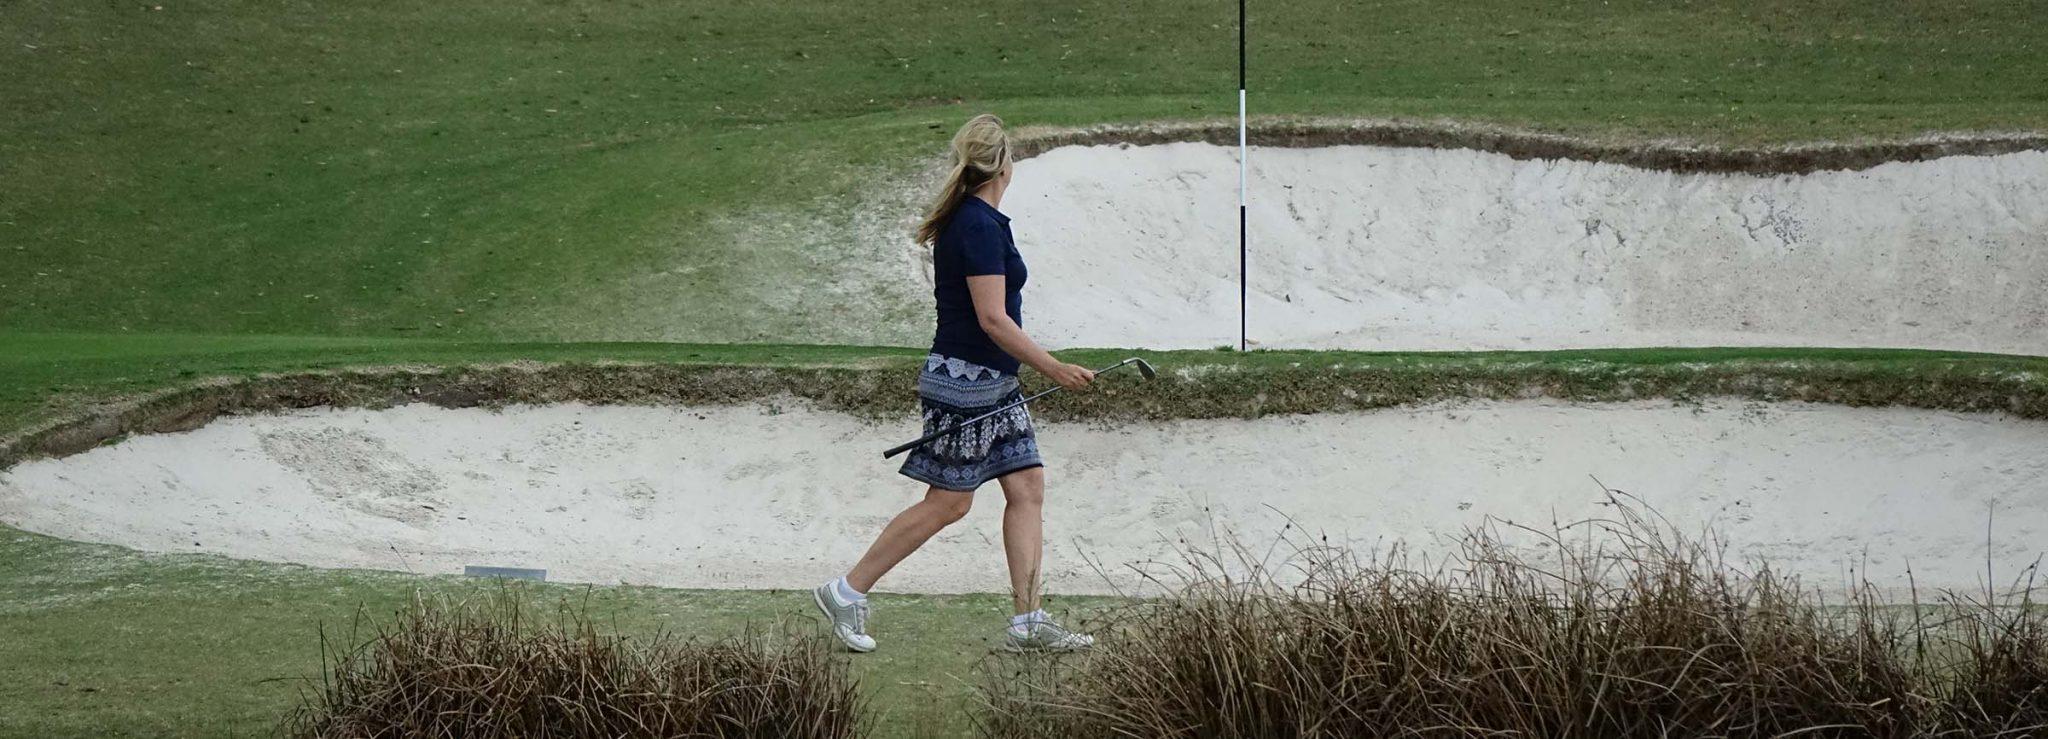 golfer walks past a bunker